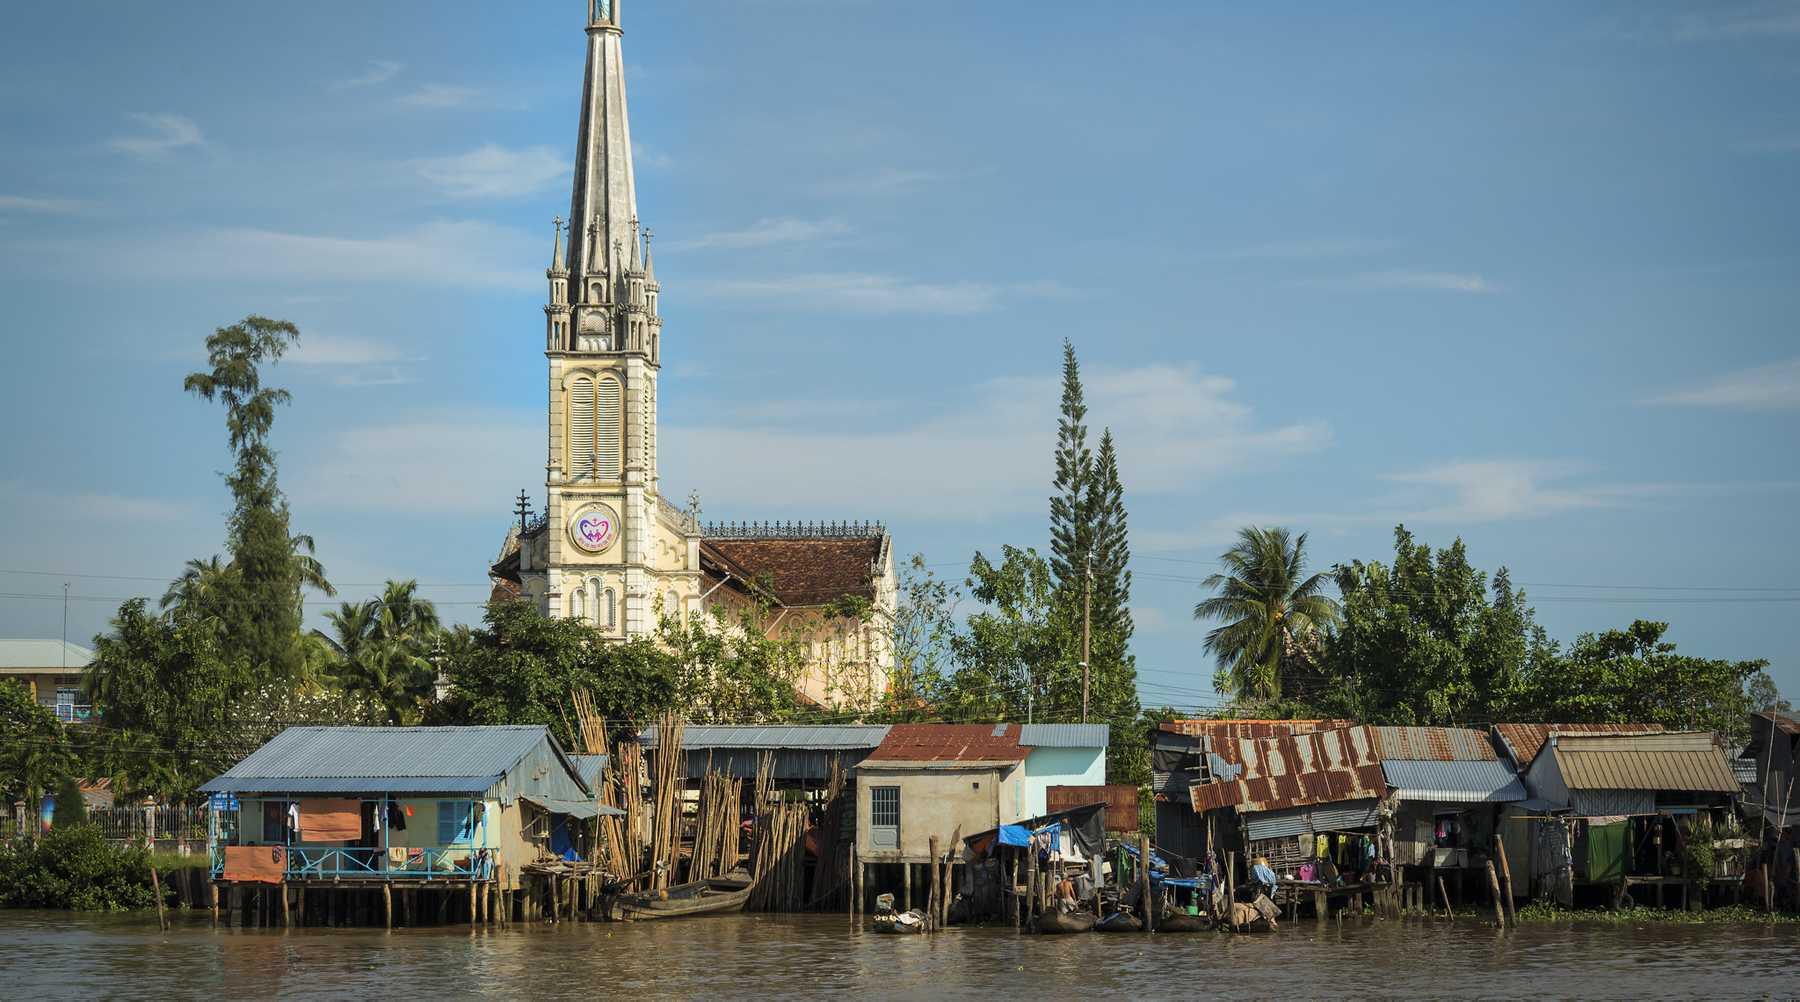 Cai Be in de Mekong Delta